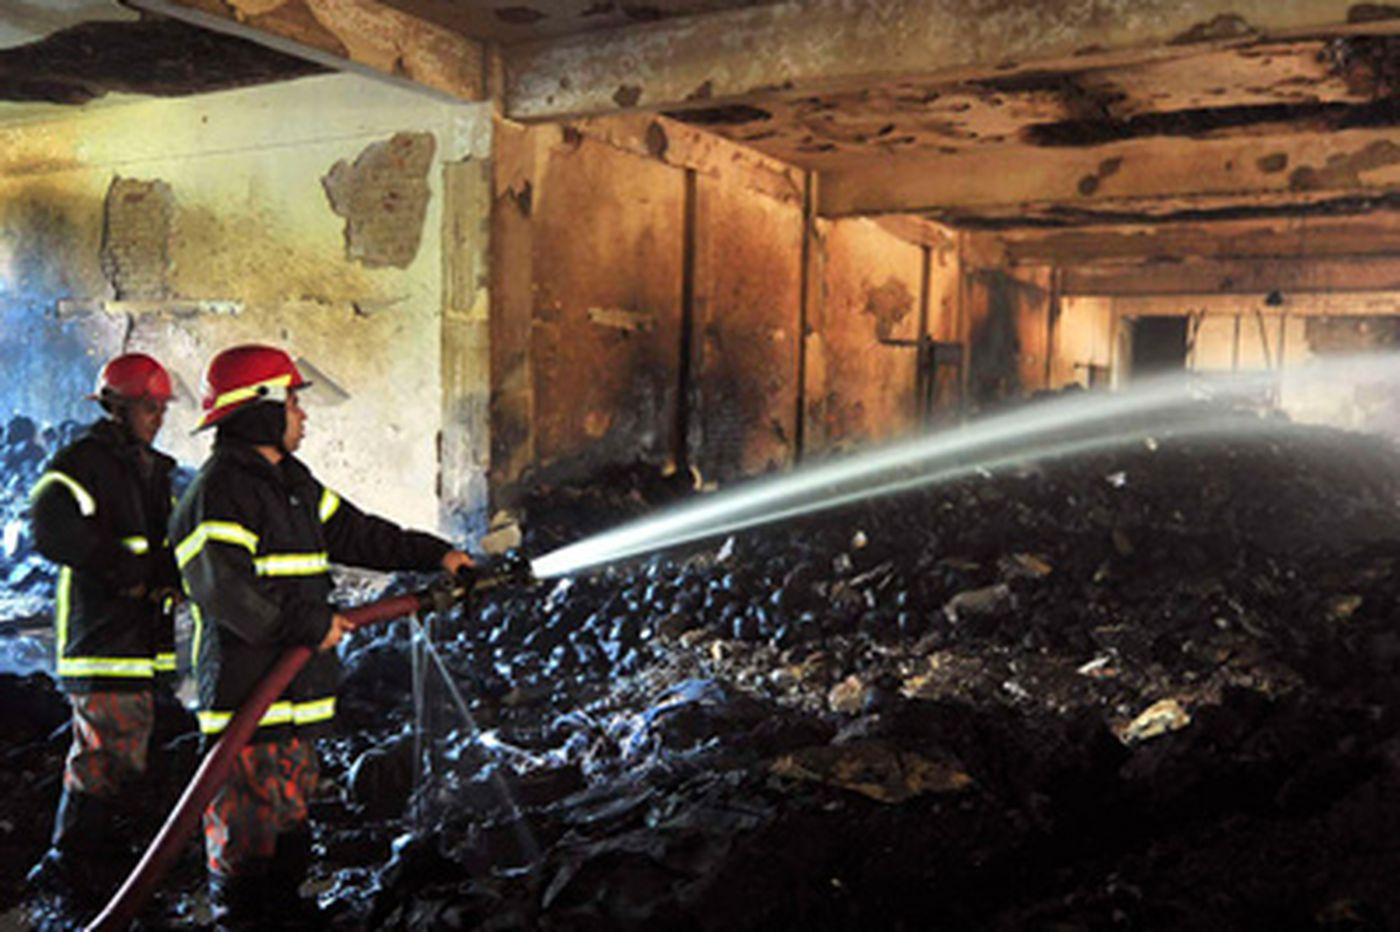 Major retailers' labels found amid fire debris